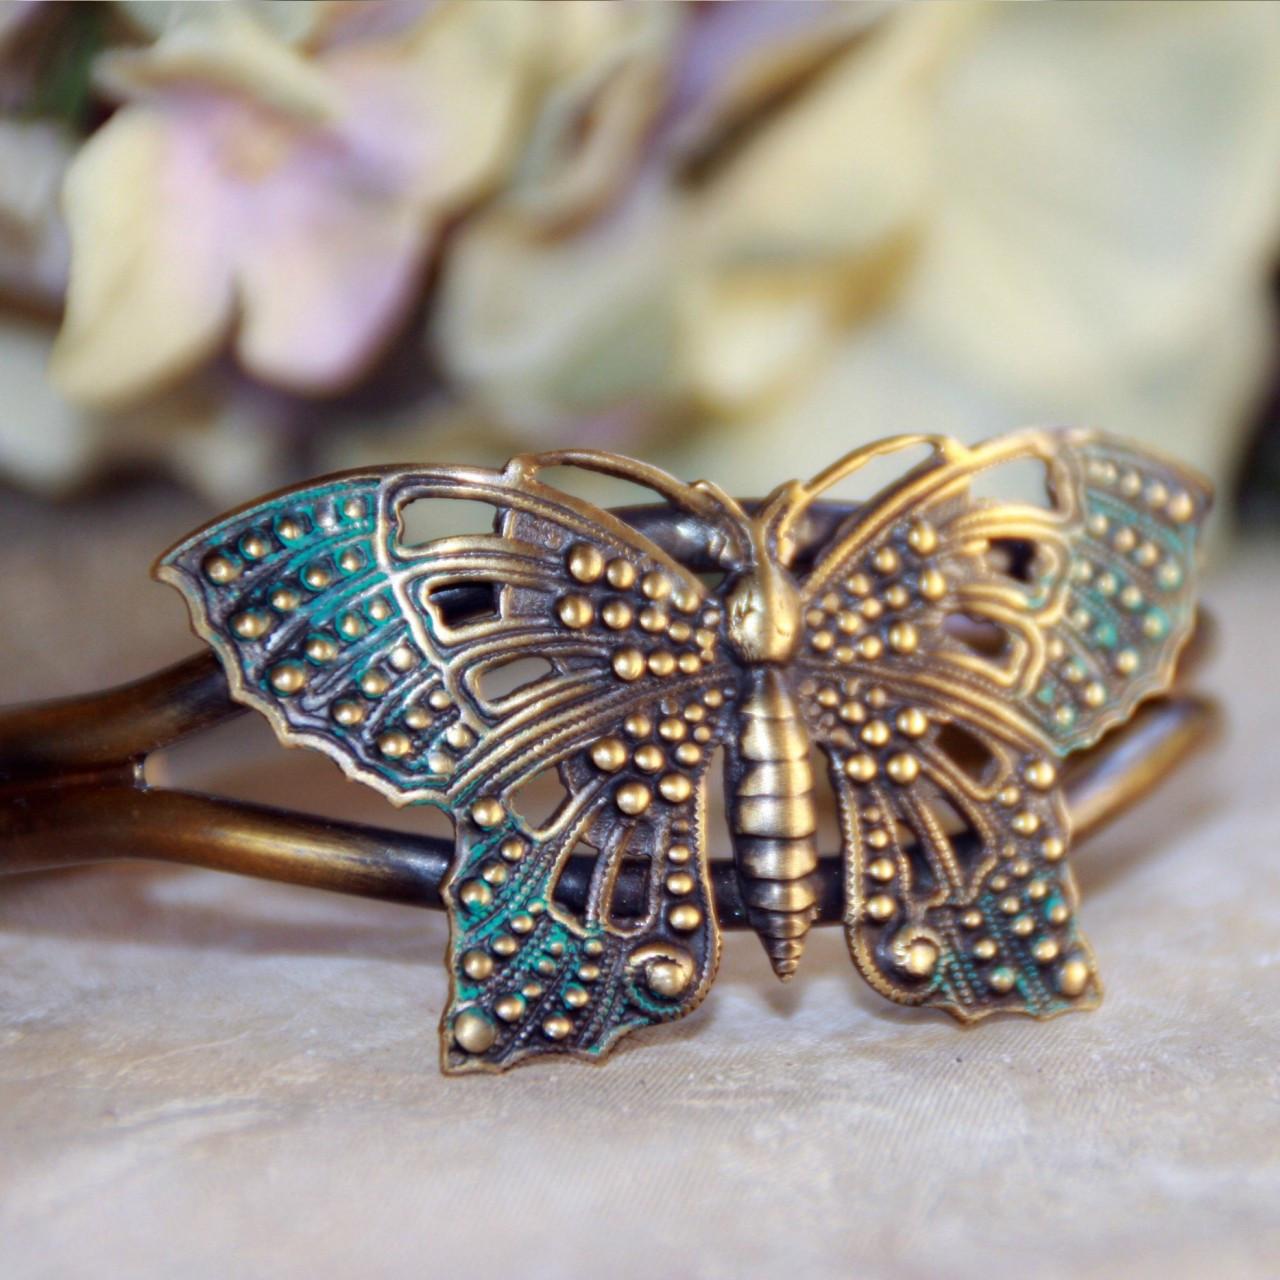 ART-118 Vintage style Butterfly Cuff Bracelet